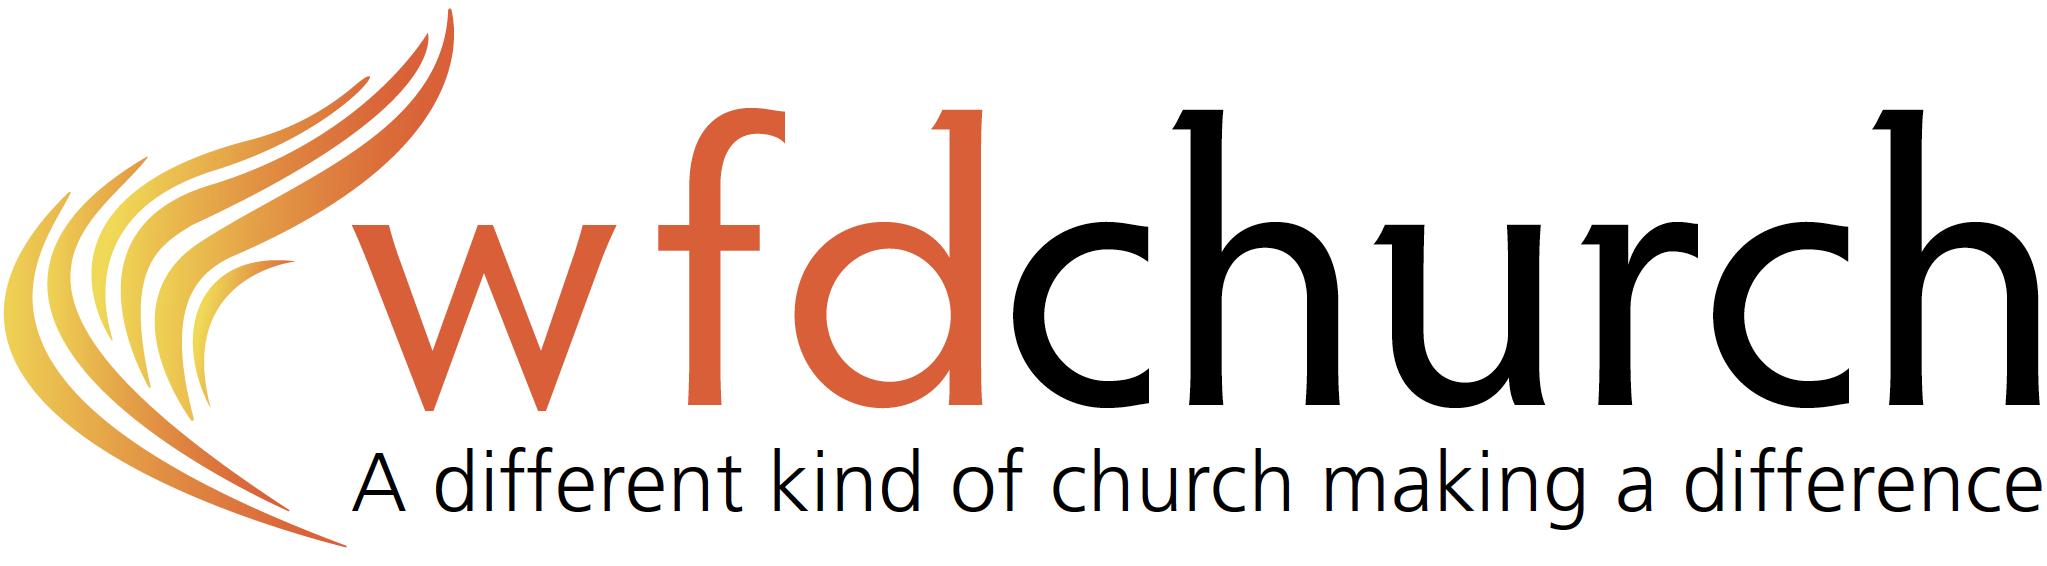 WFDChurch.com